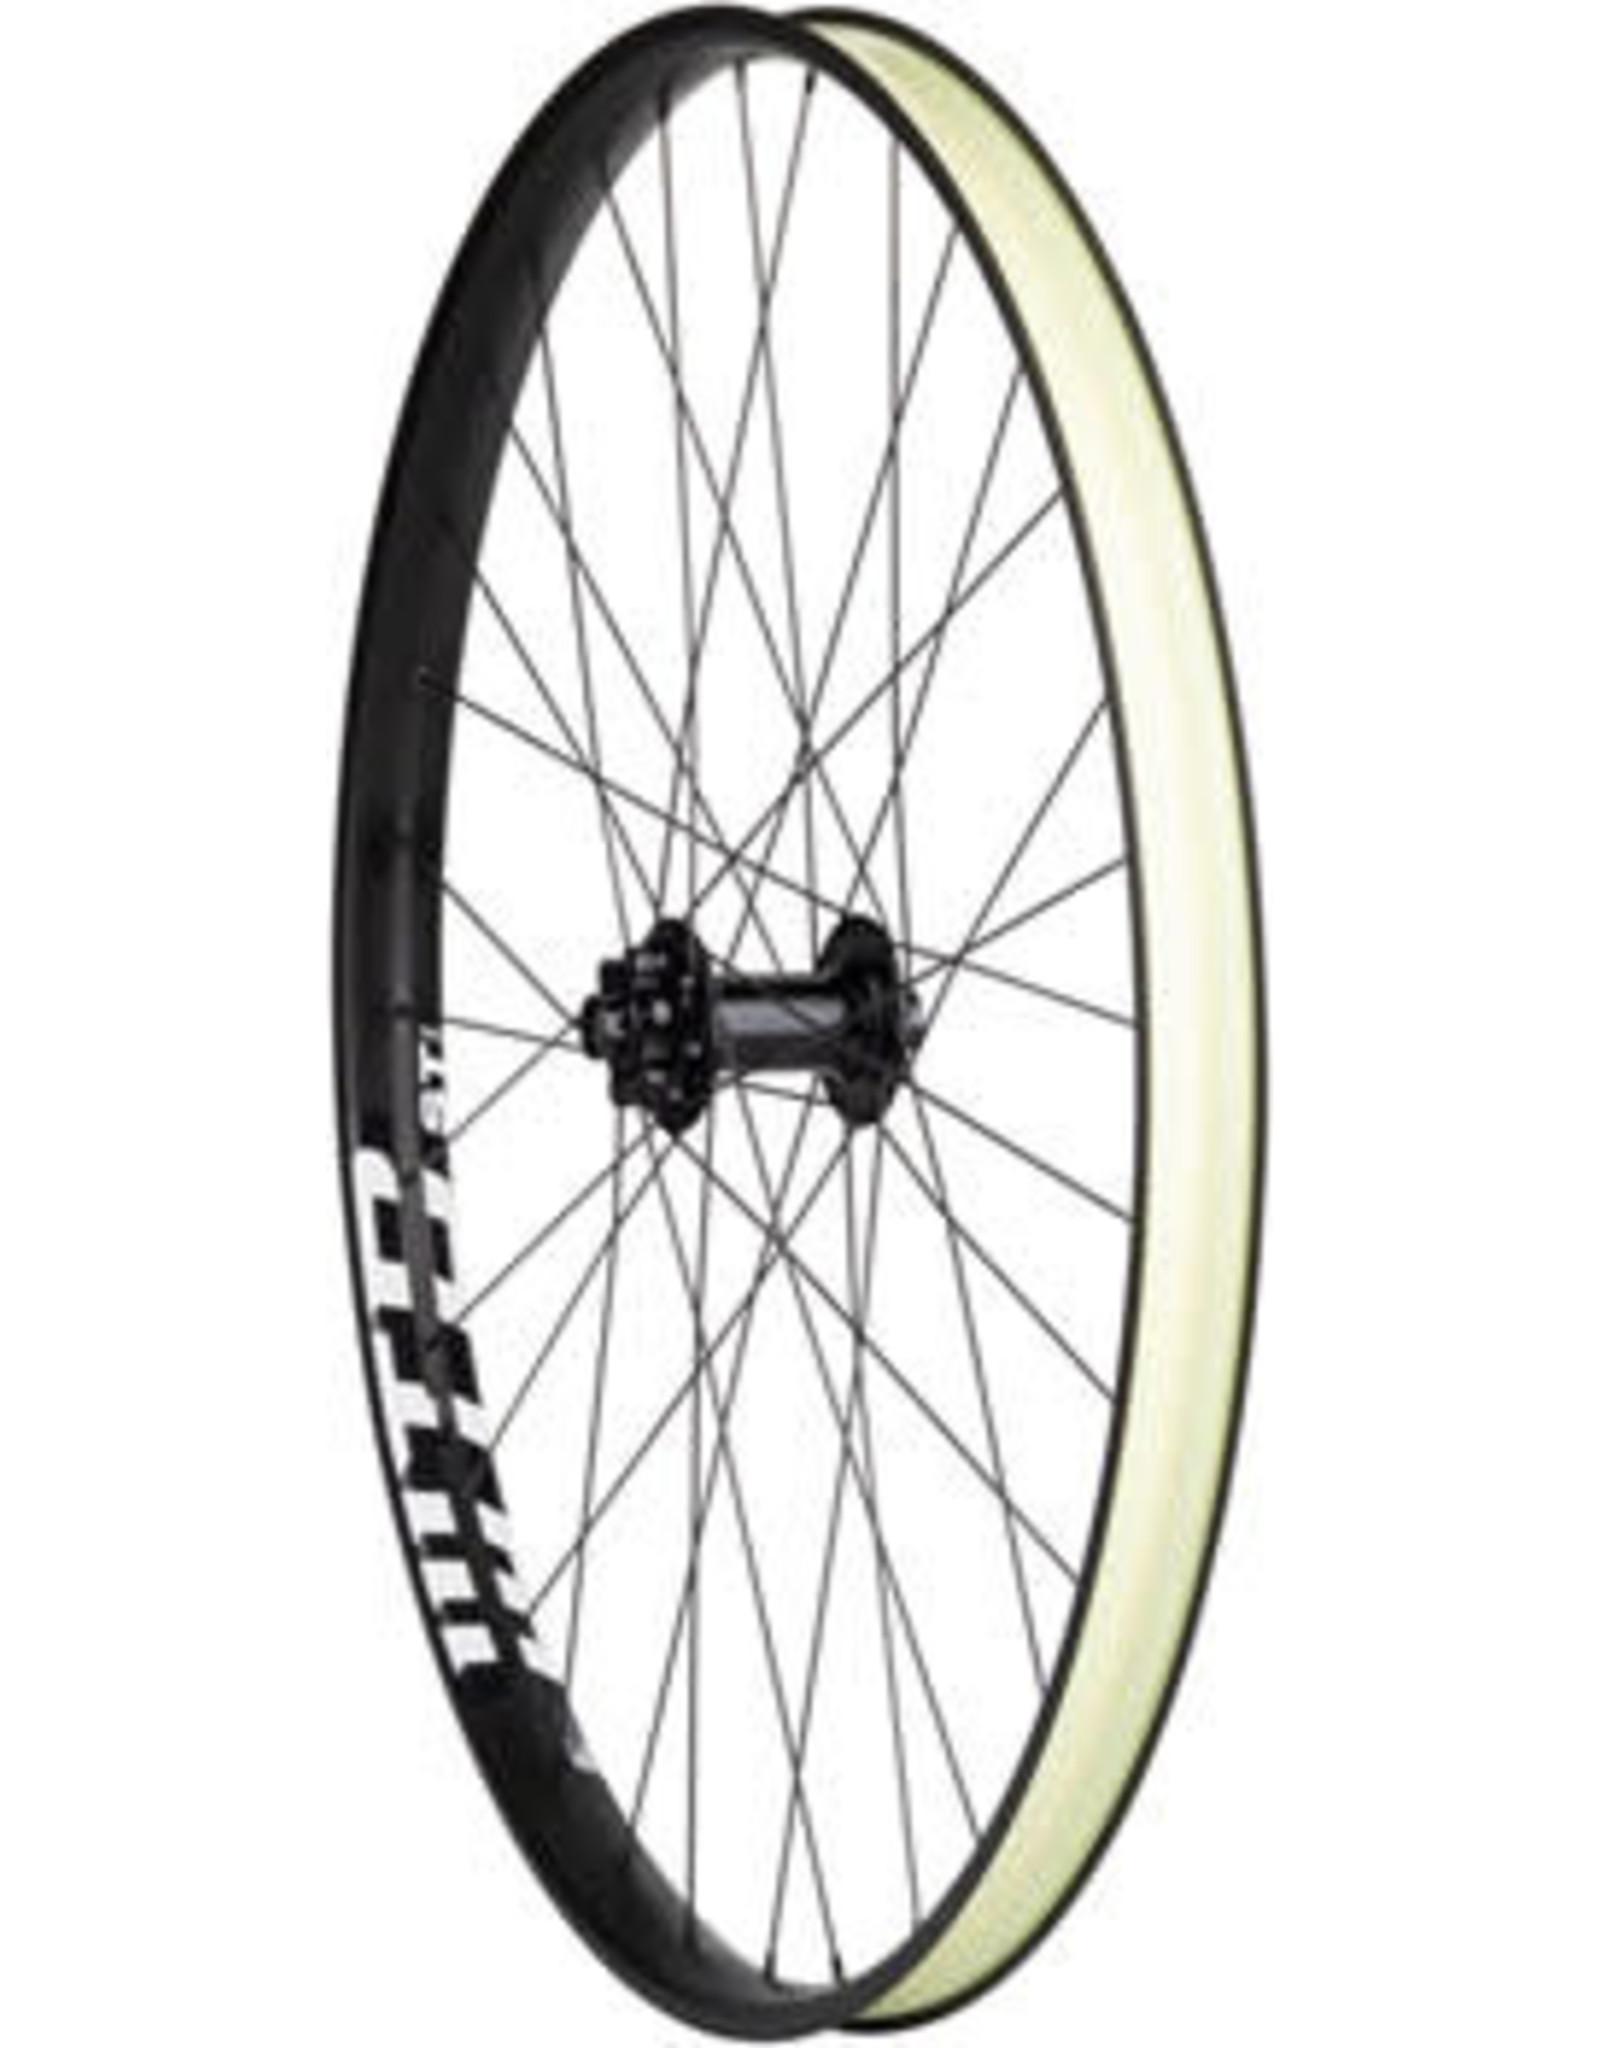 "Quality Wheels Quality Wheels WTB i35 Disc Front Wheel - 29"", 15 x 110mm, 6-Bolt, Black"